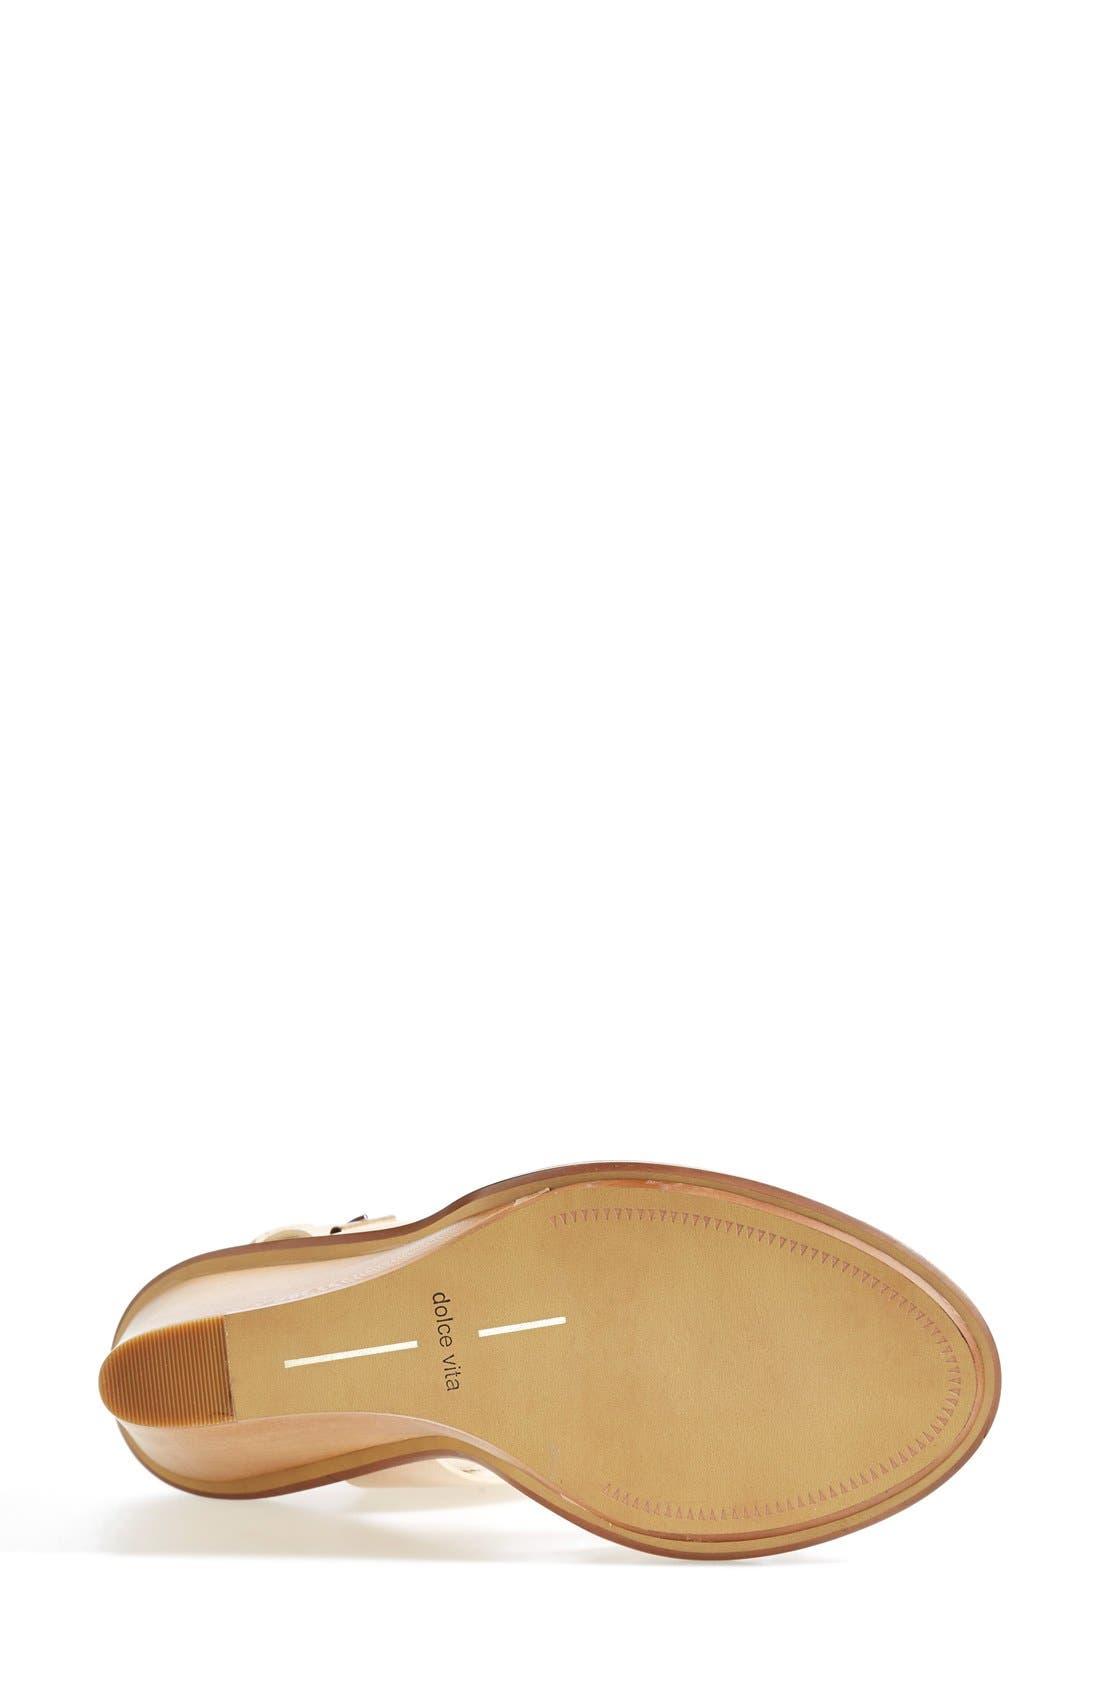 Alternate Image 4  - Dolce Vita 'Jodi' Snake Embossed Leather Wedge Sandal (Women)